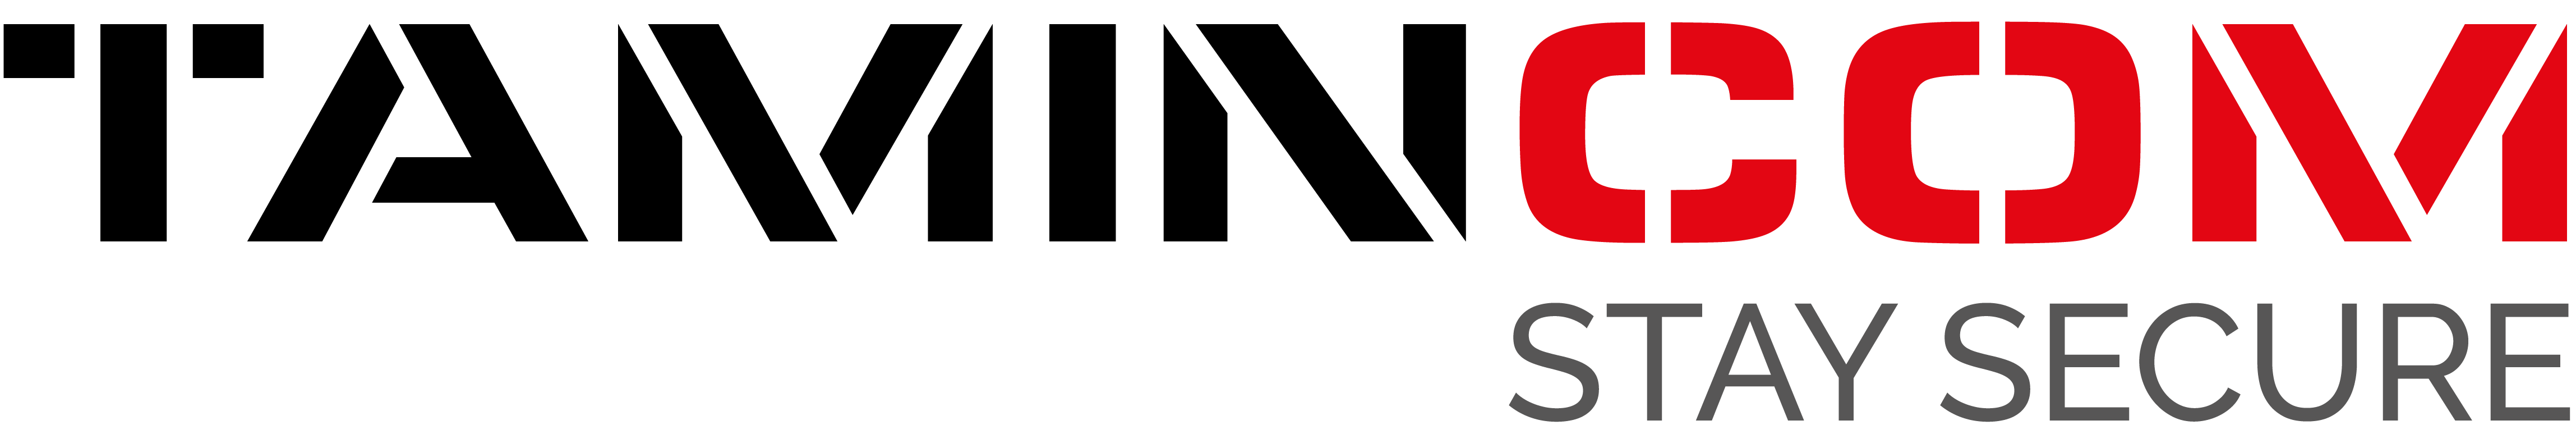 Tamincom